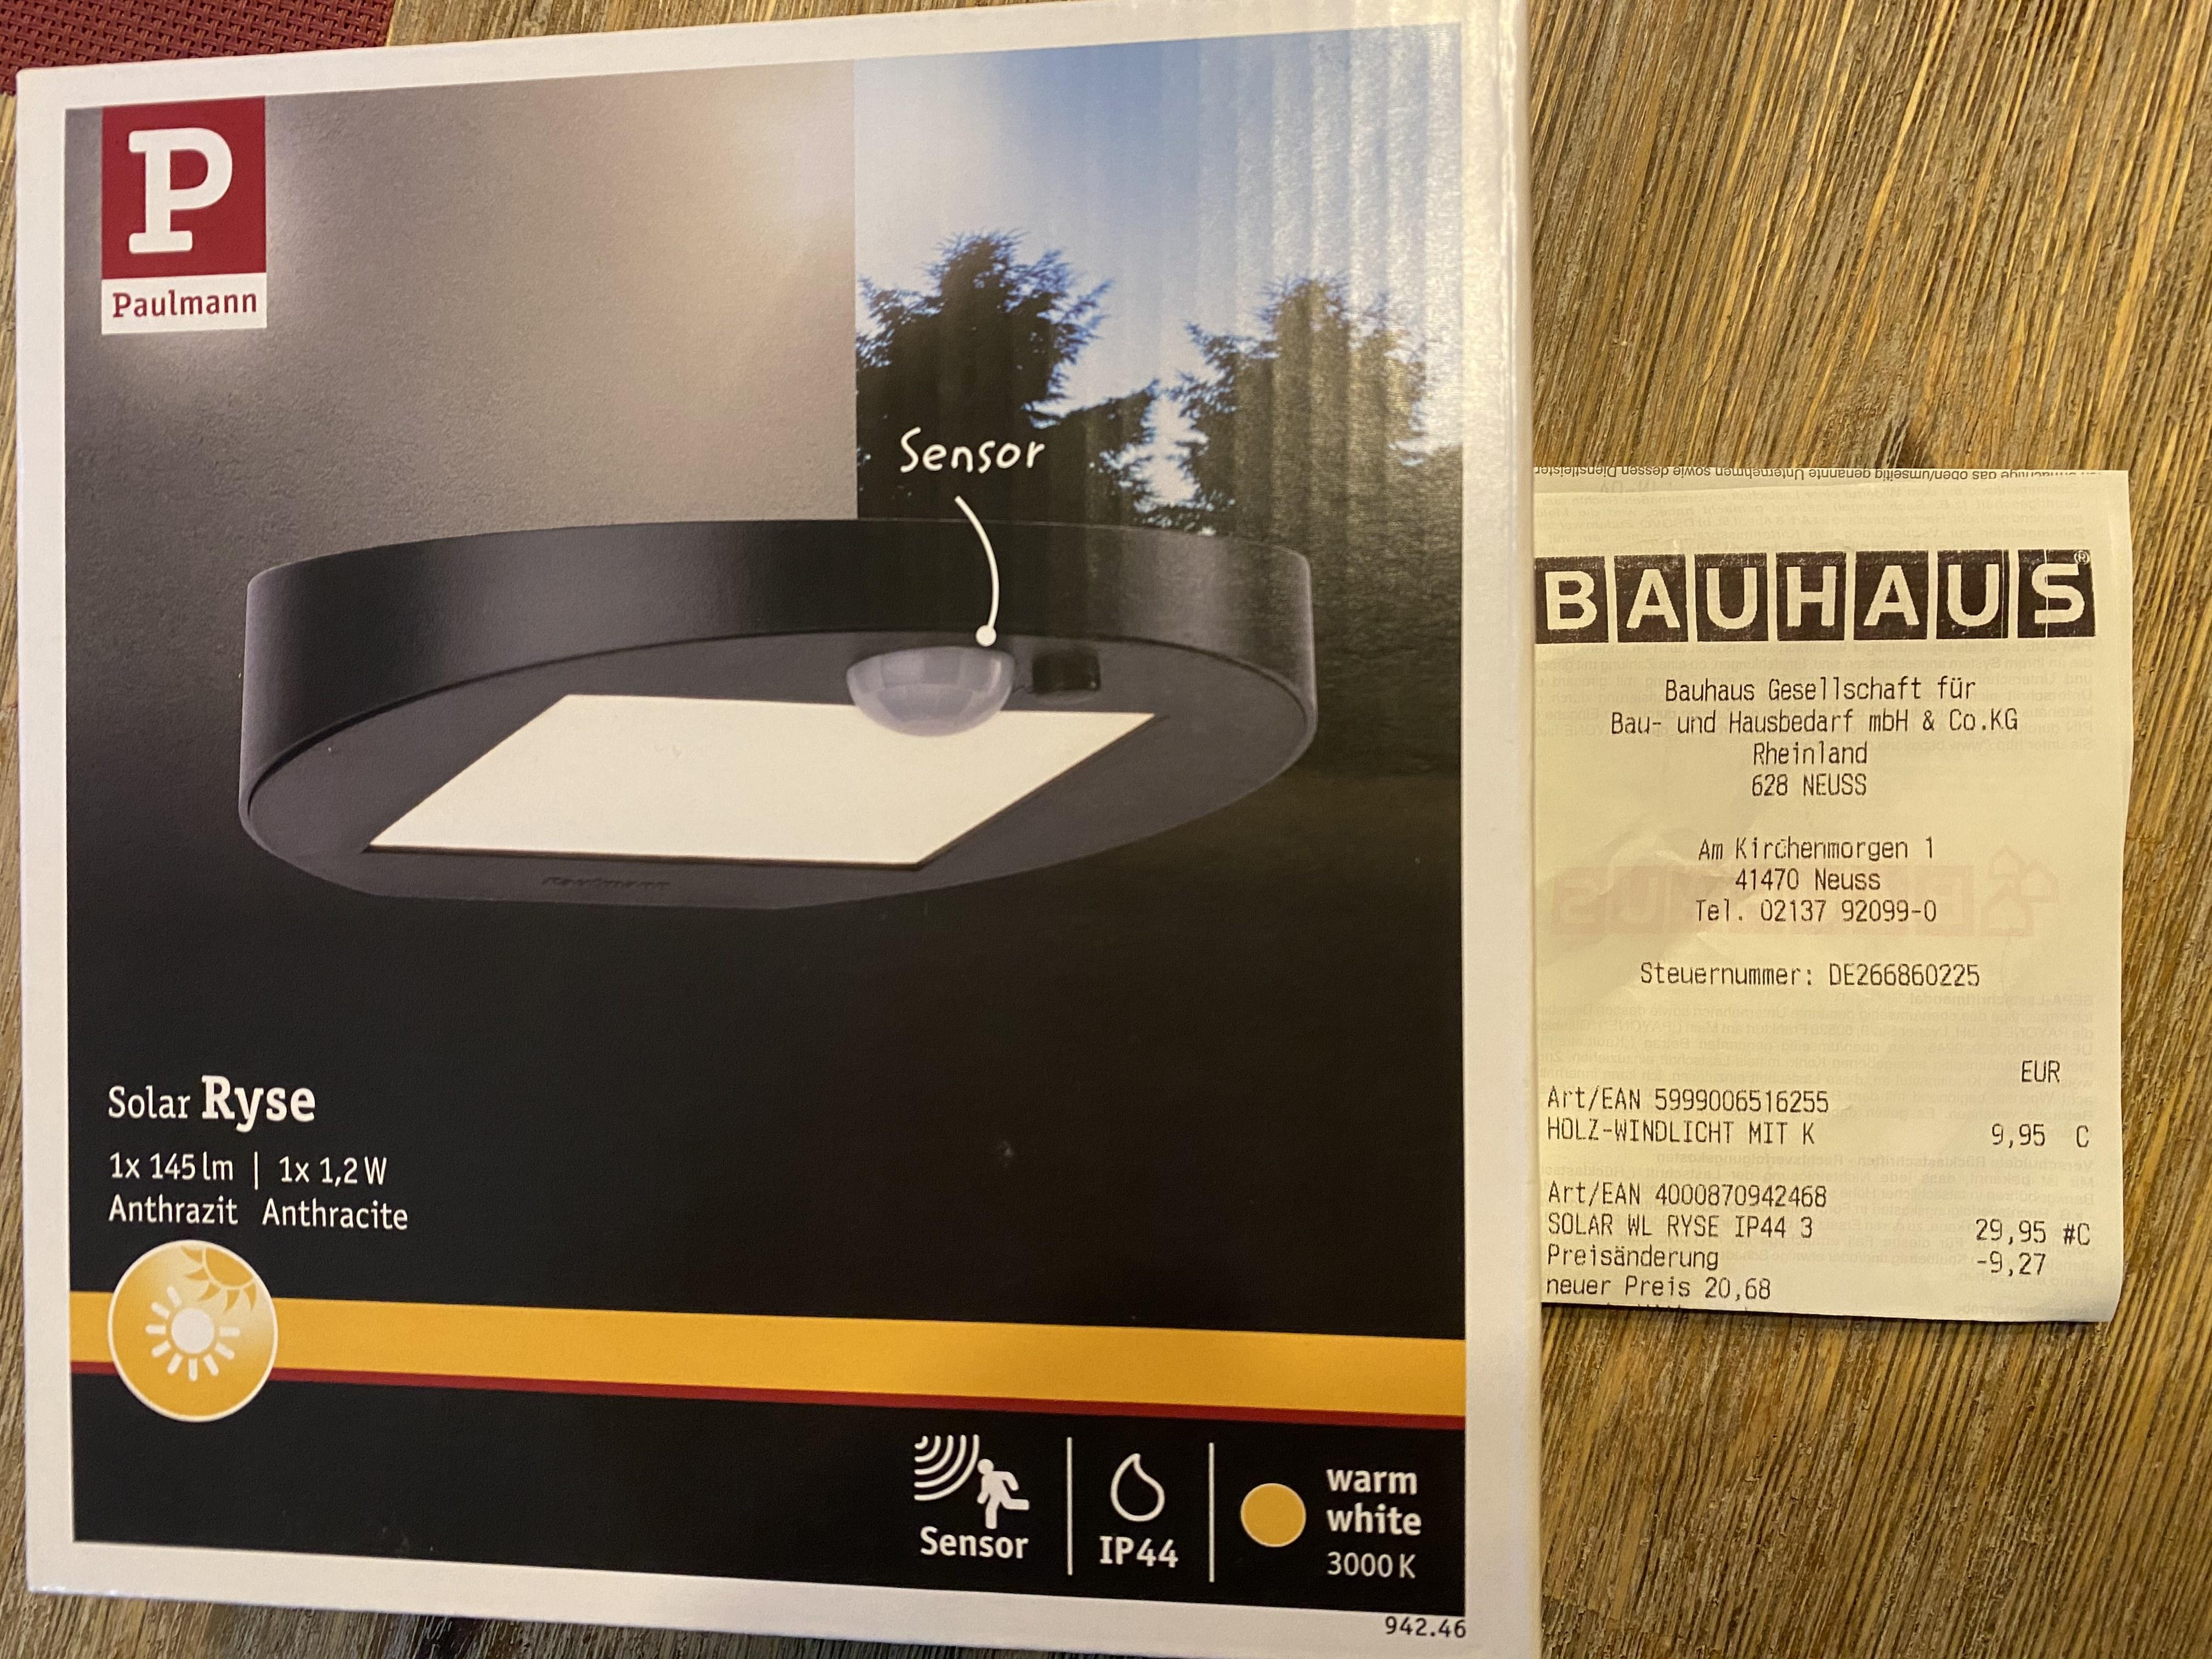 [Bauhaus TPG] Paulmann Solar Ryse Außenbeleuchtung